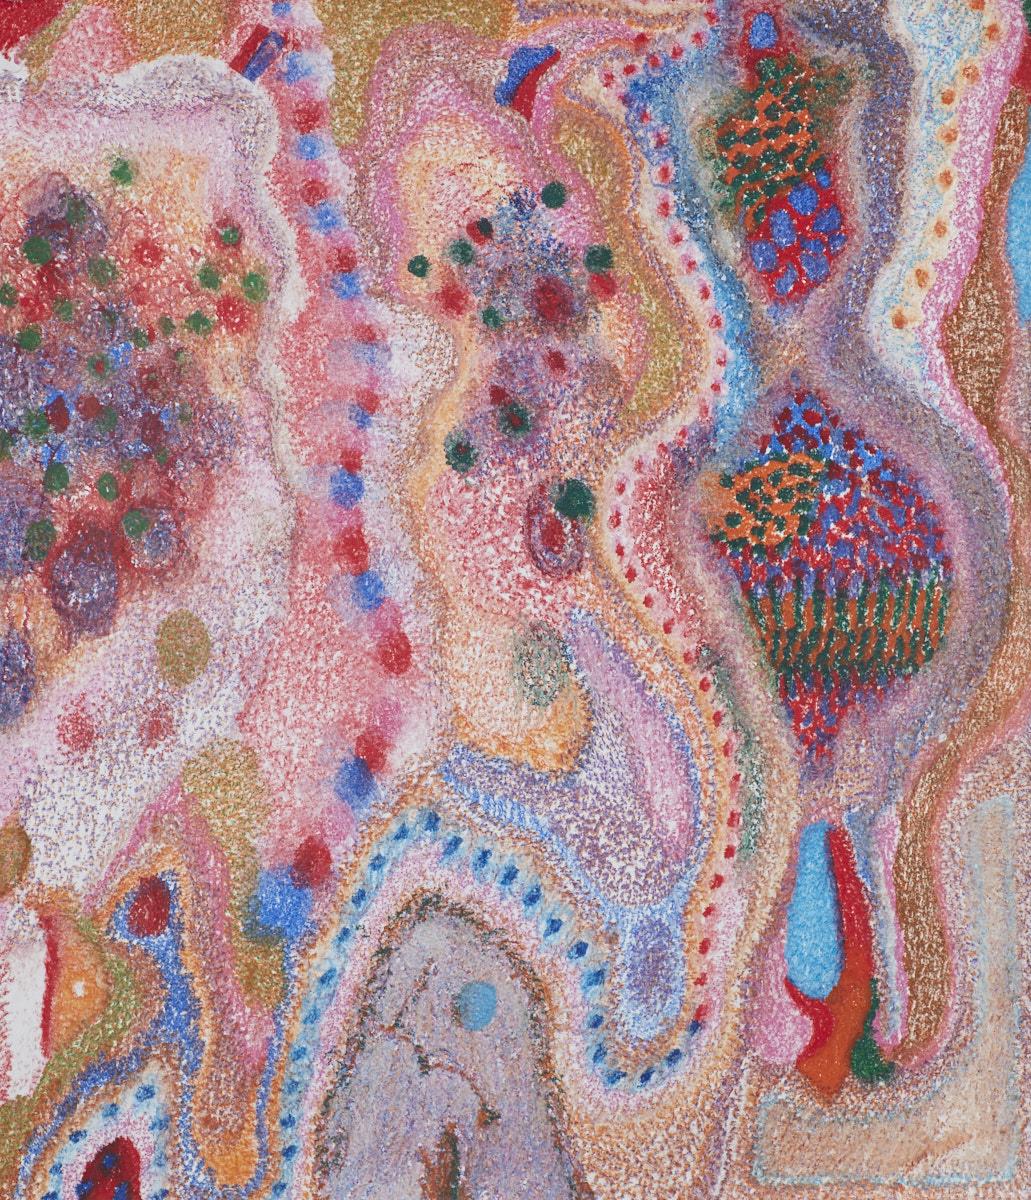 O.T ( Mozambique Primal Scream I ), 2018  Buntstift auf Papier, 150x180cm